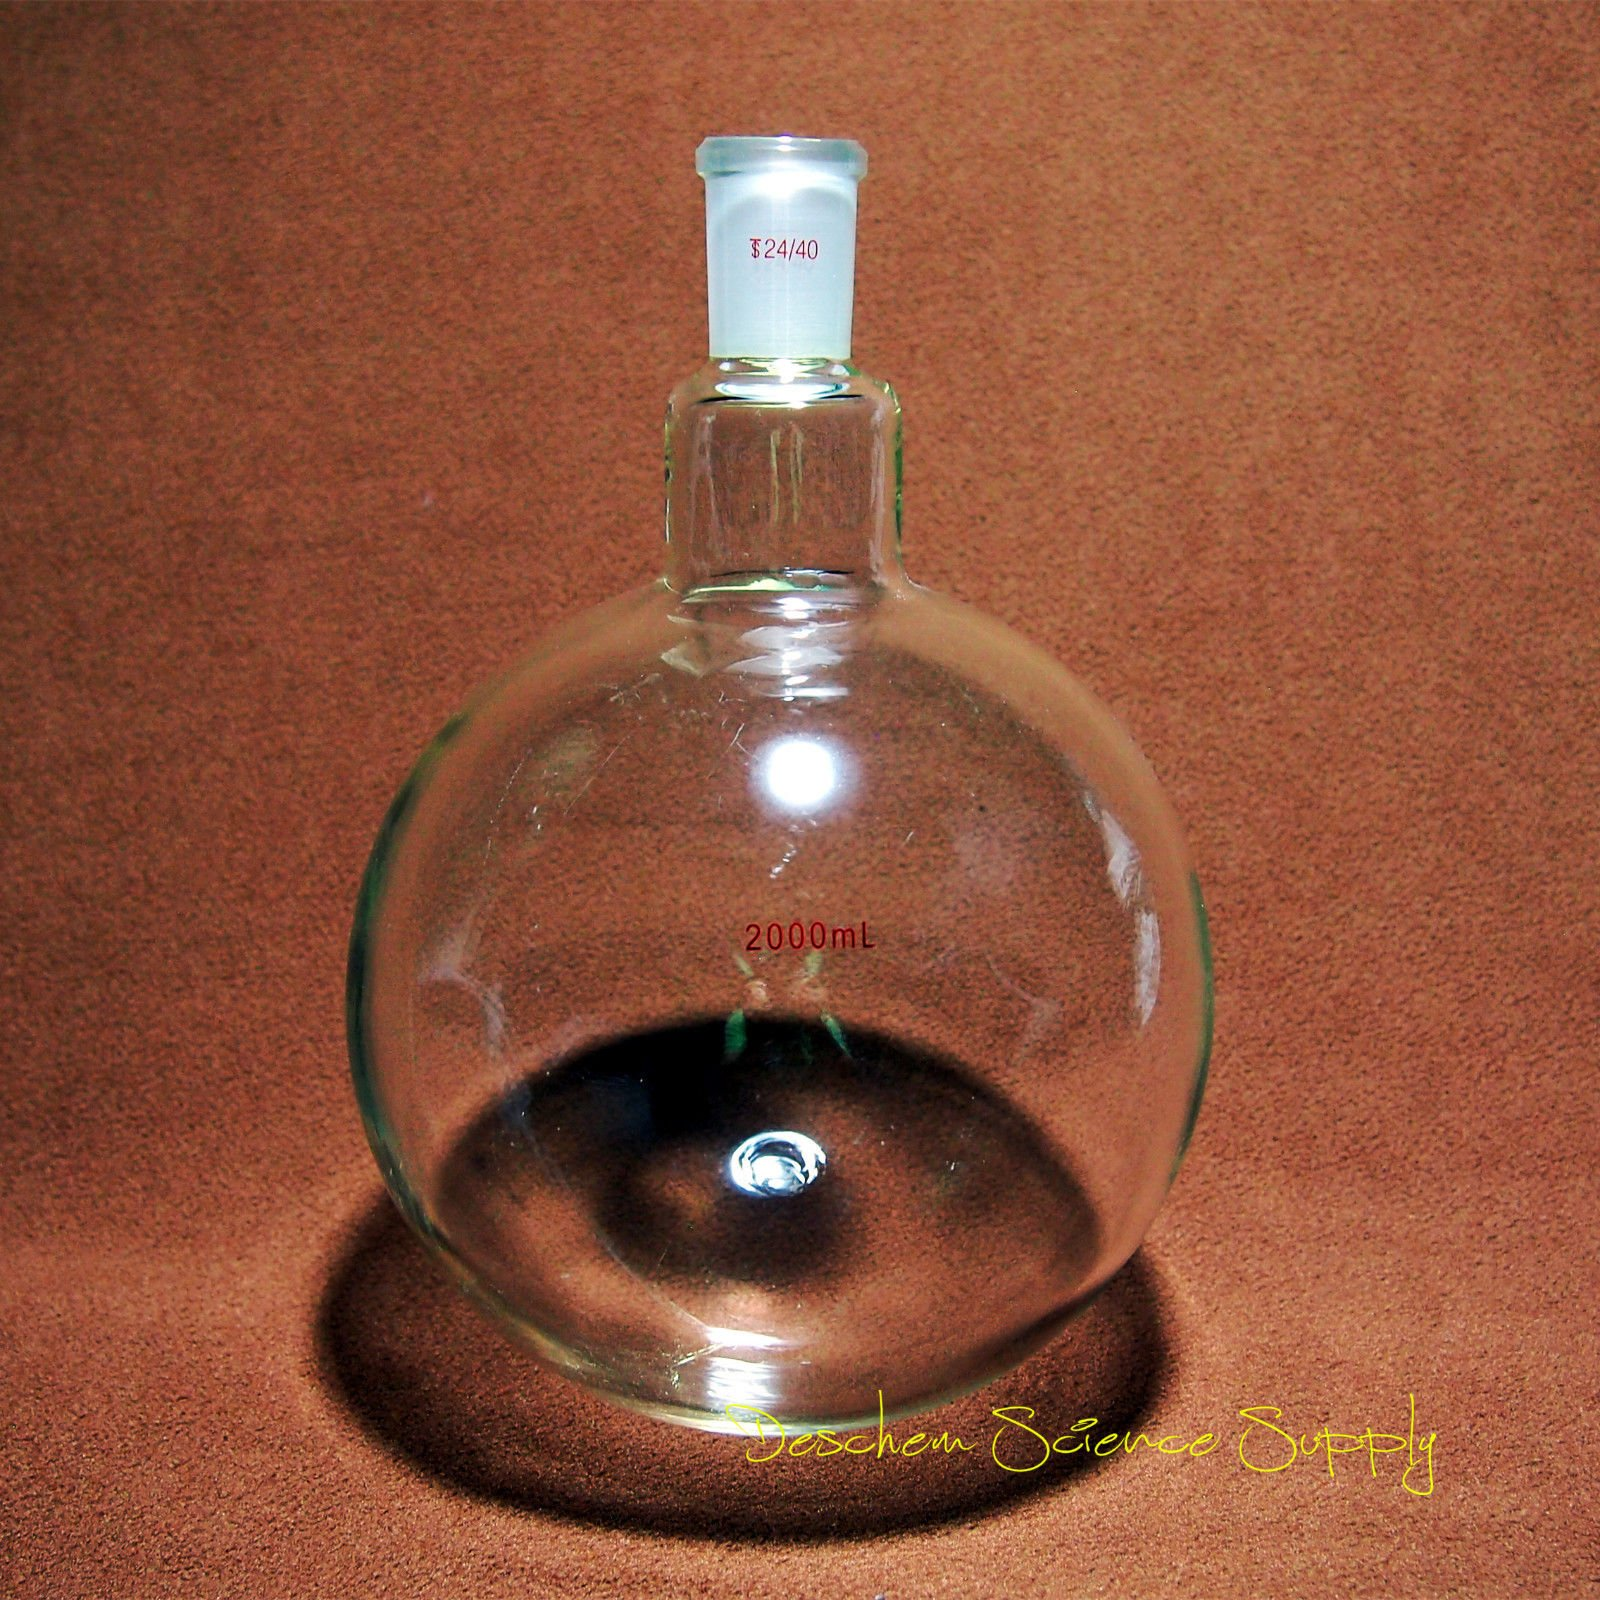 Deschem 2000ml,24/40,Sigle Neck,Round Bottom Glass Flask,One-neck,2L Lab Boiling Bottle